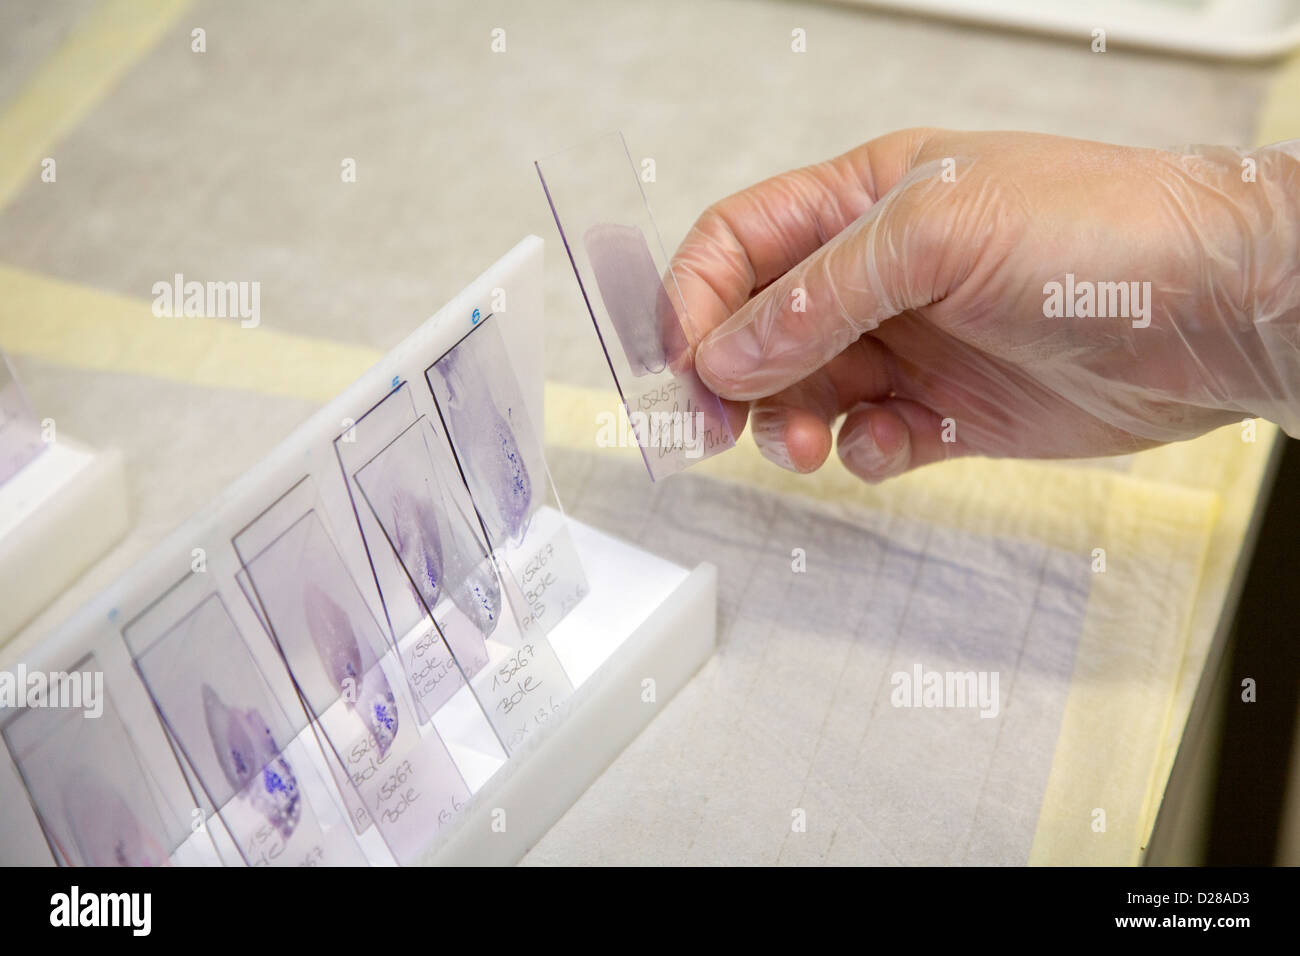 Essen, Germany, manufactures Zytologieassistentin Gewebepraeparate Stock Photo